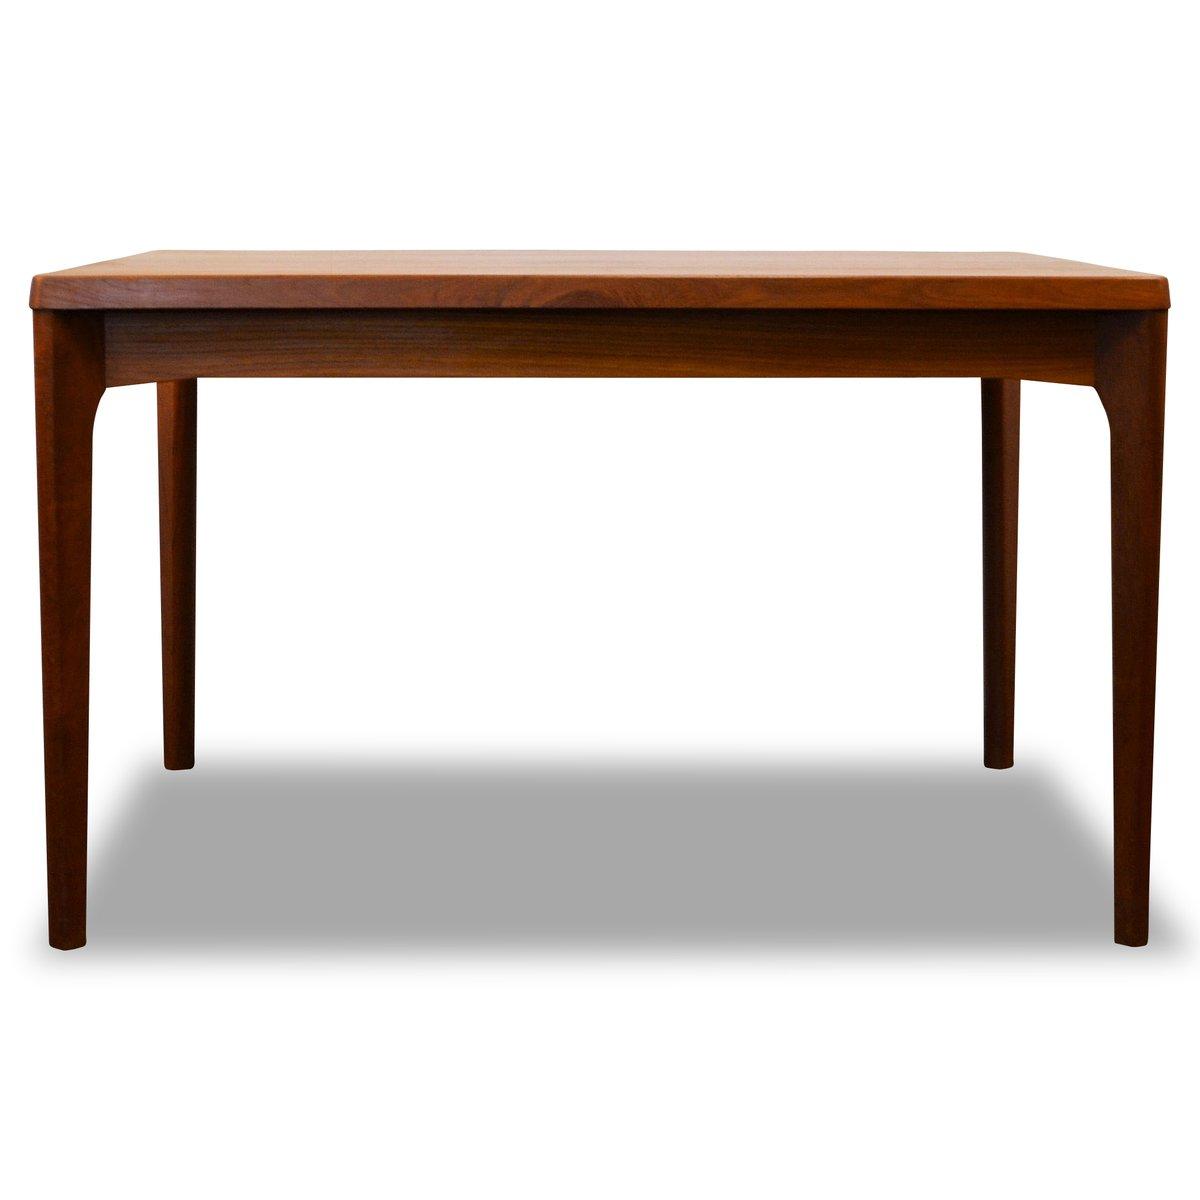 Danish Teak Extendable Dining Table by Henning Kjaernulf  : danish teak extendable dining table by henning kjaernulf for vejle stole mobelfabrik 1960s 14 from www.pamono.co.uk size 1200 x 1200 jpeg 40kB